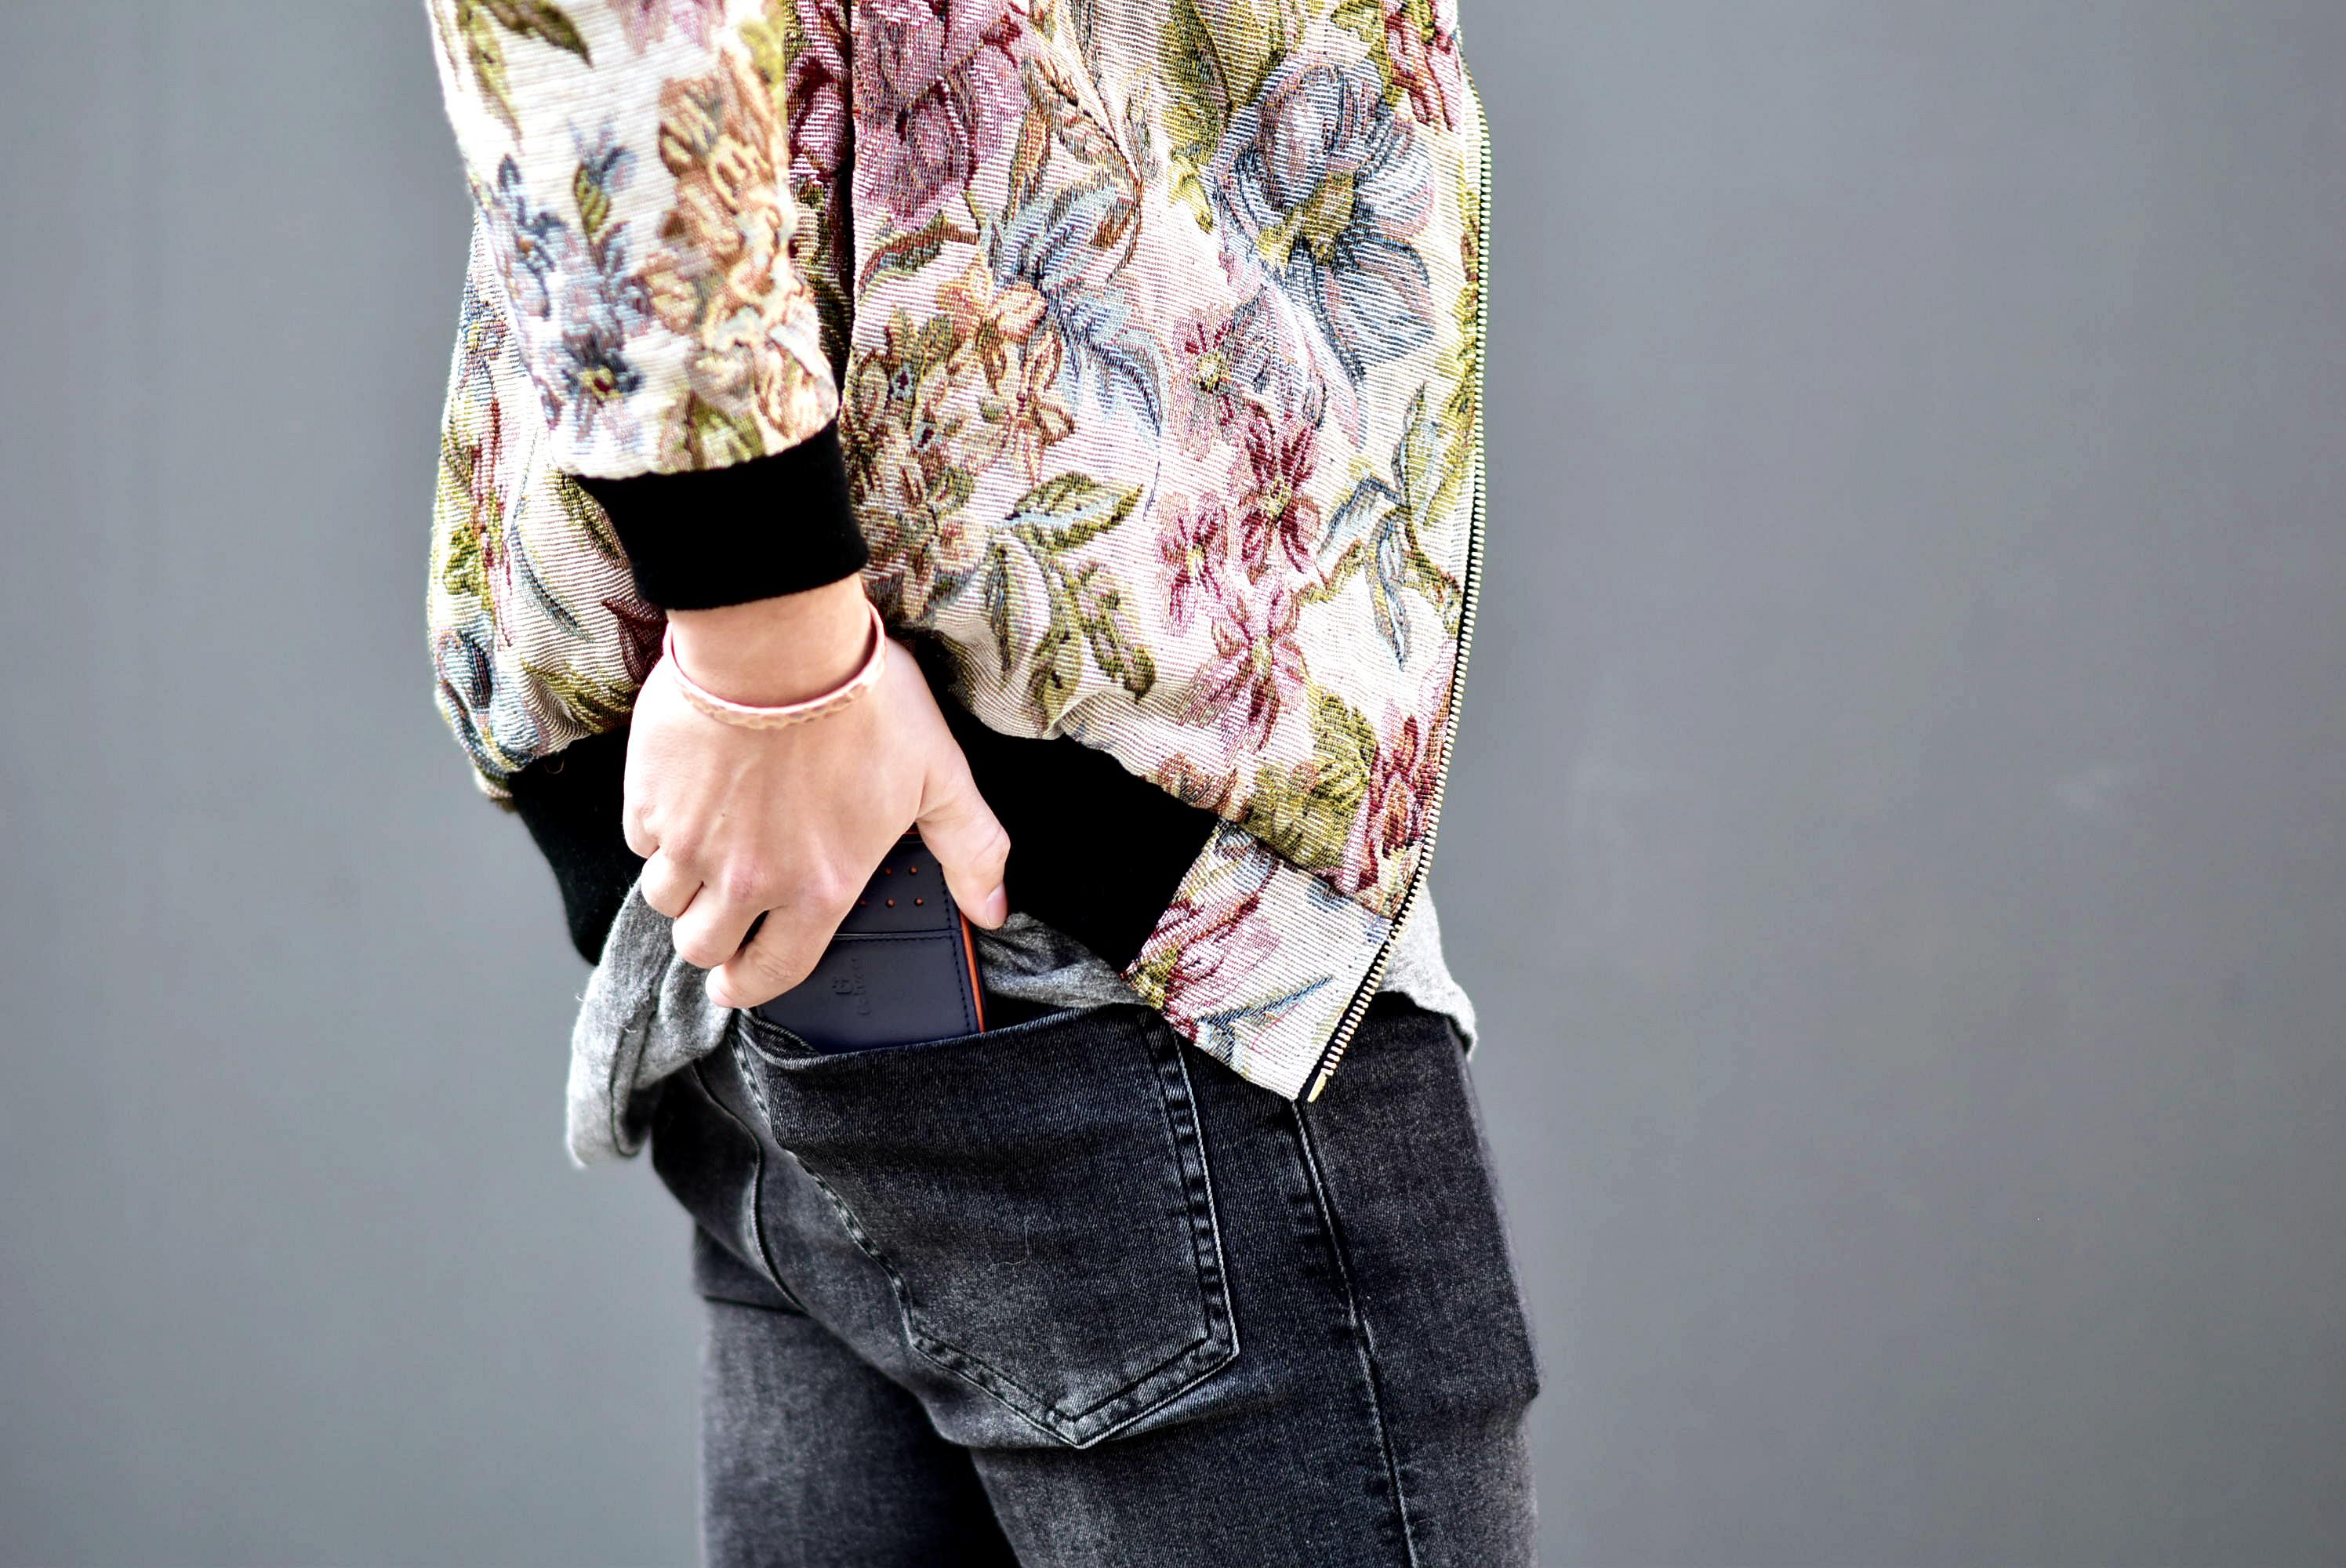 Tommeezjerry-Styleblog-Männerblog-Männer-Modeblog-Berlin-Berlinblog-Outfit-Streetlook-Bomberjacke-Vintage-Graues-Shirt-Skinny-Jeans-Sonnenbrille-Vintagelook